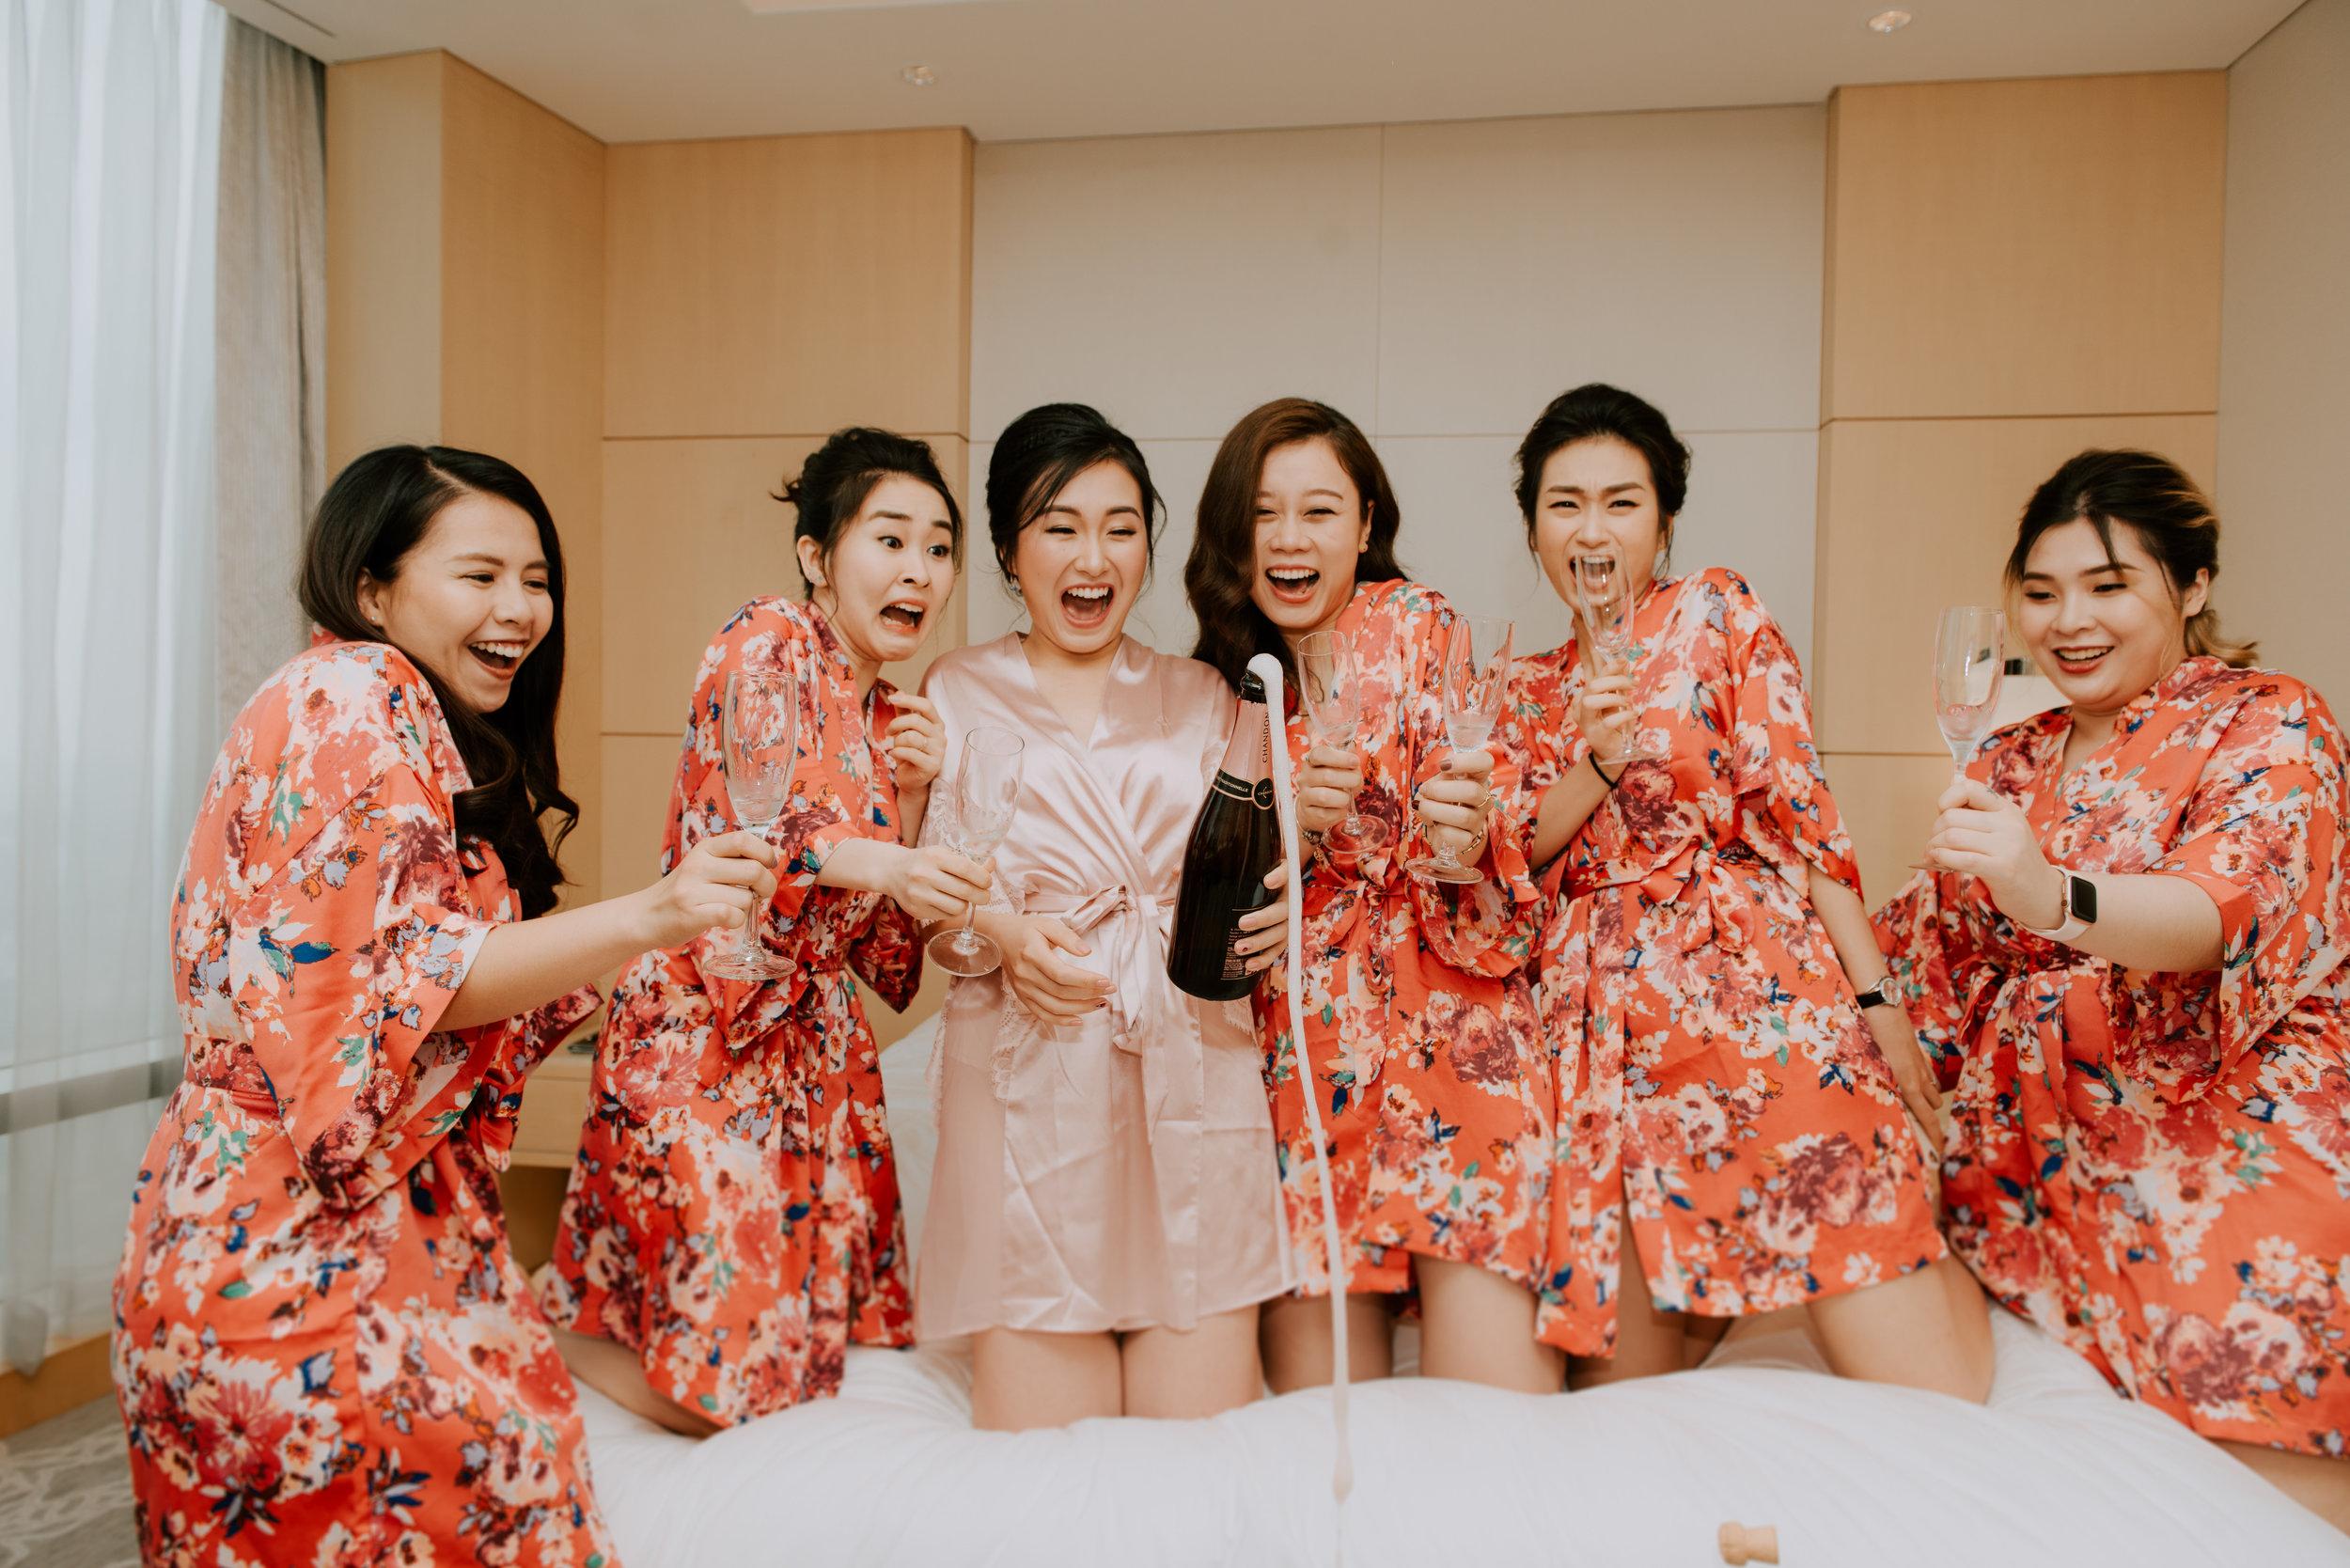 Mirrorwedding Destination Photographer TopofHanoi Duc Anh Hien Trang 155652-2.jpg